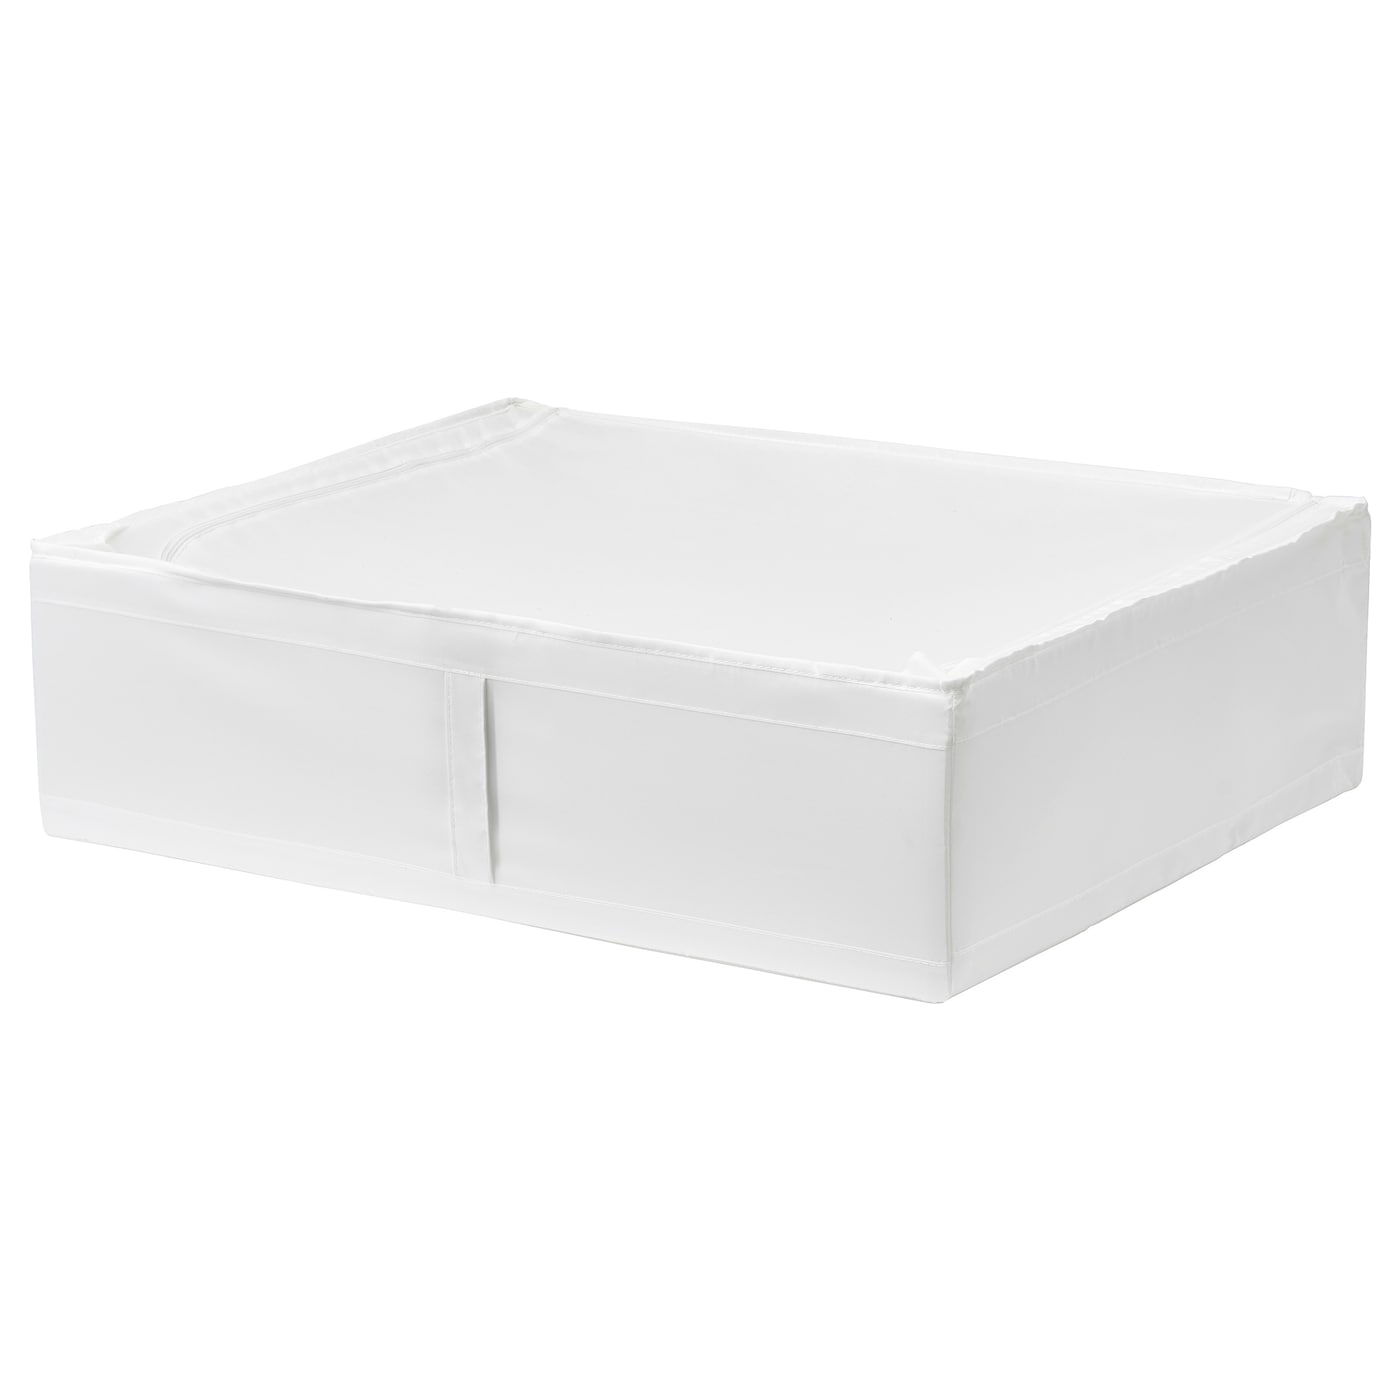 Skubb Sac De Rangement Blanc 69x55x19 Cm Ikea